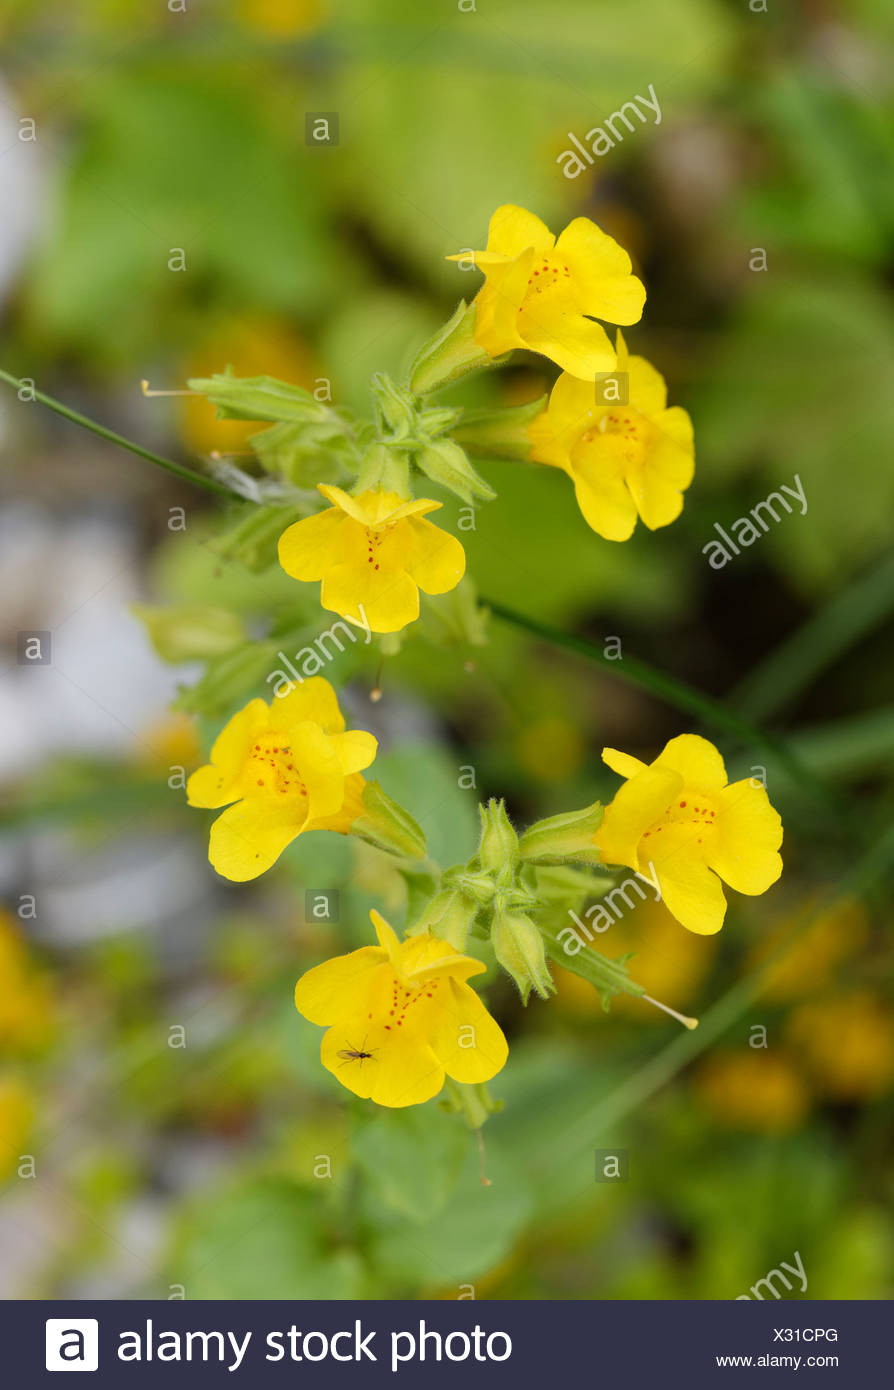 Germany Bavaria Yellow Monkey Flower Mimulus Guttatus Close Up